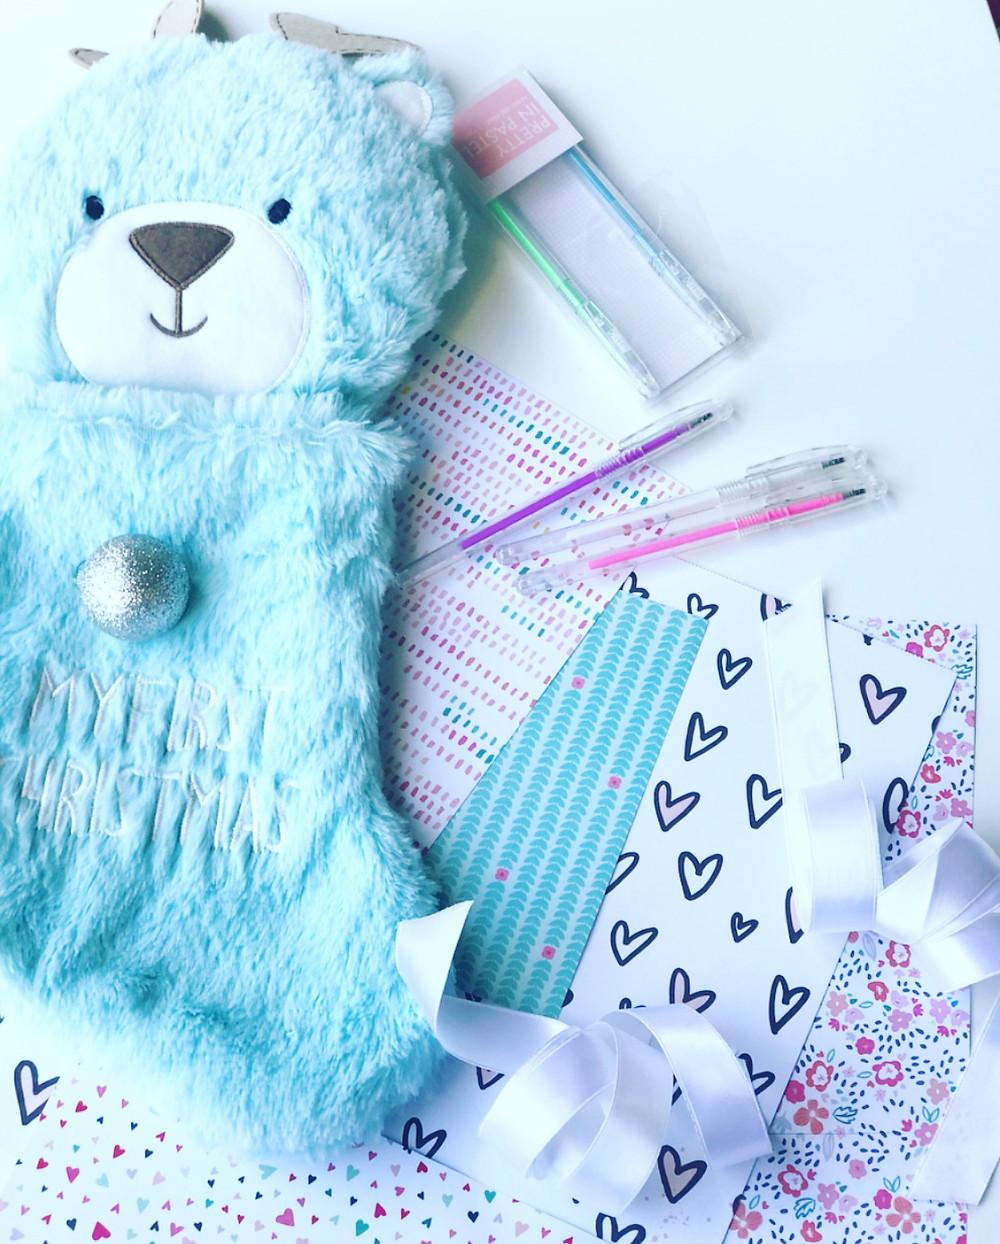 gift paper & pastel pens